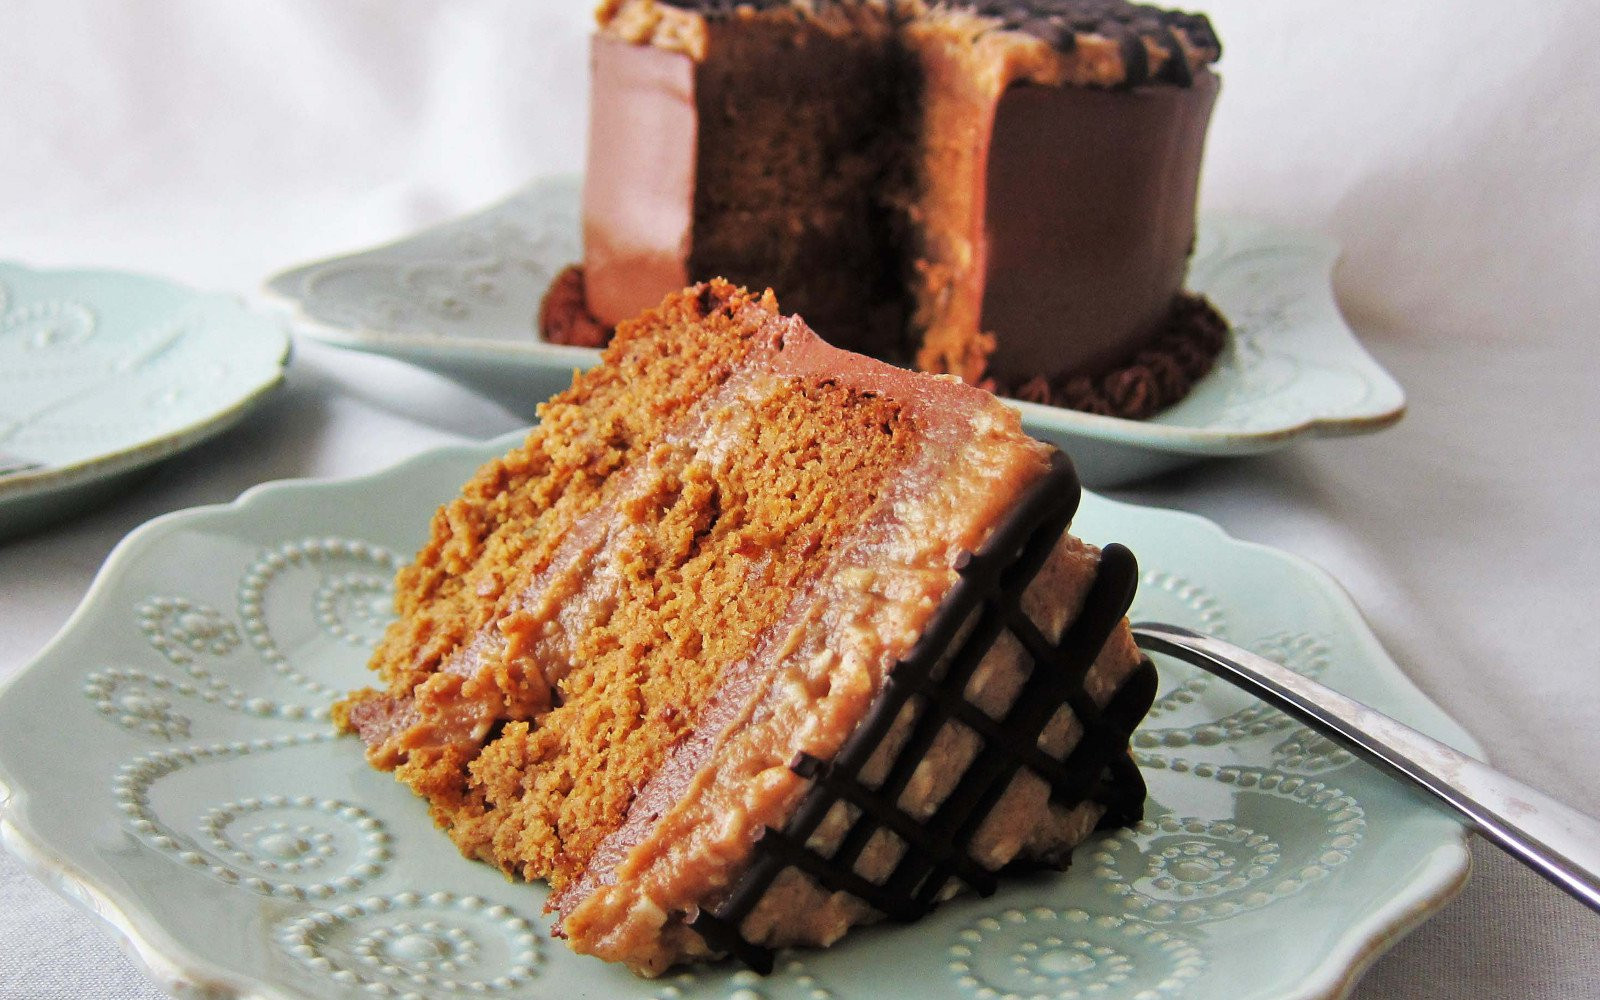 Vegan Birthday Cake  15 Decadent Vegan Birthday Cake Recipes e Green